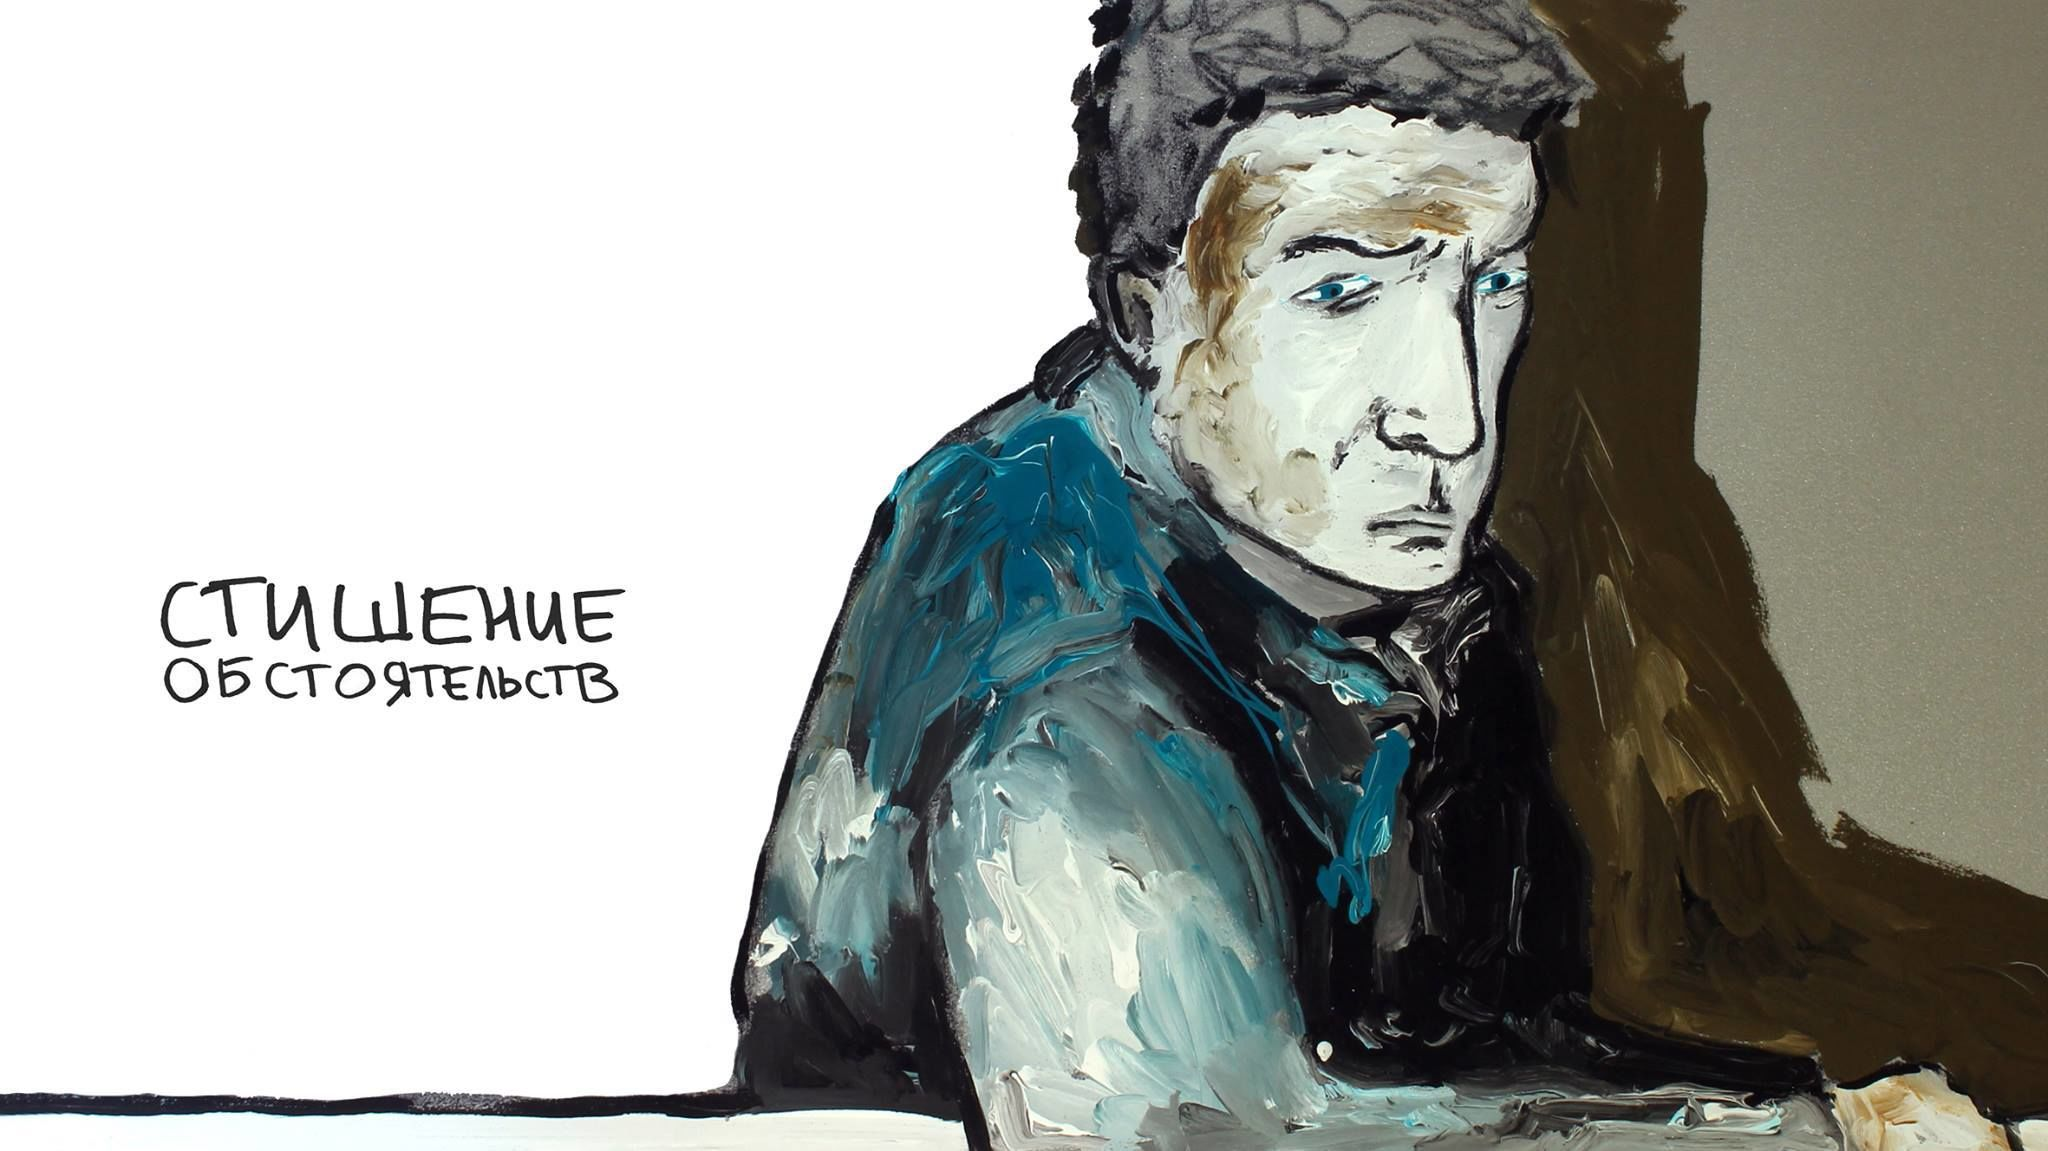 "Презентація проекту Антона Слєпакова ""Стишение обстоятельств"""